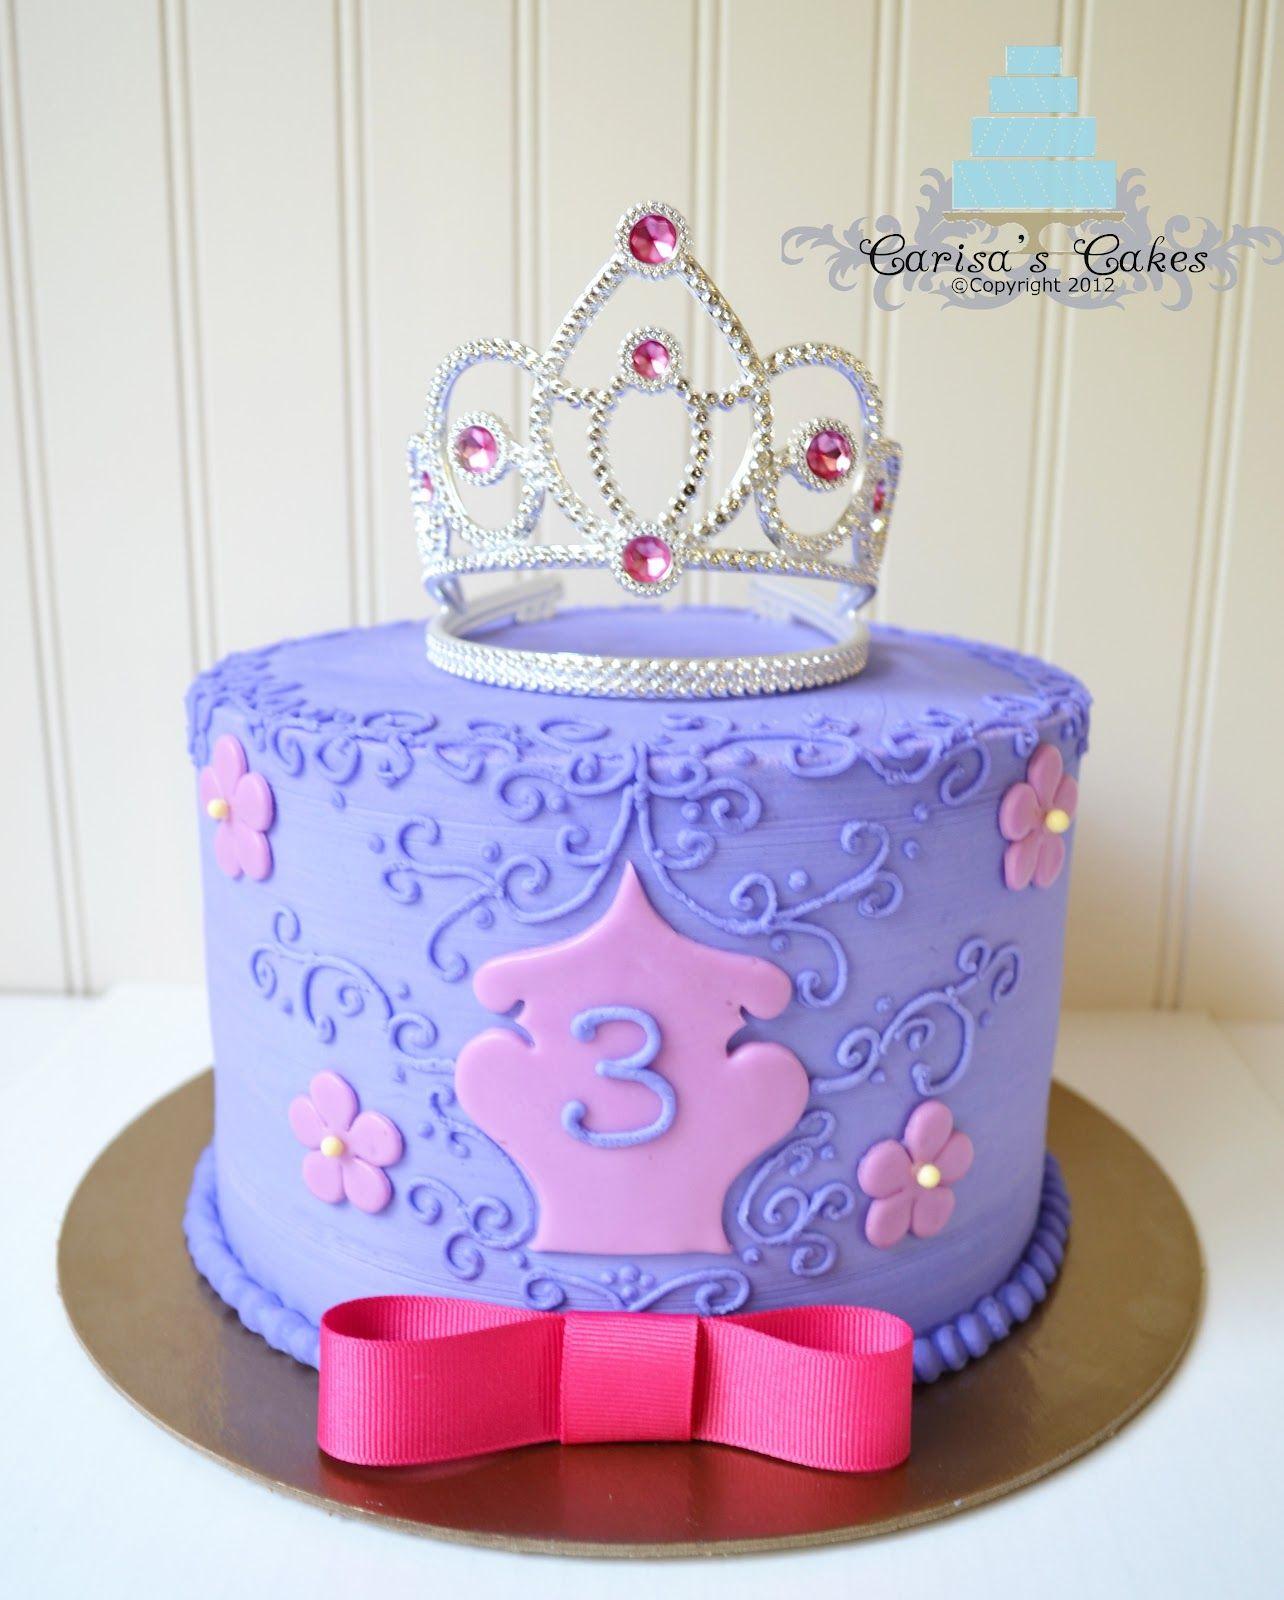 Walmart Bakery Birthday Cakes Photos Carisa S Cakes